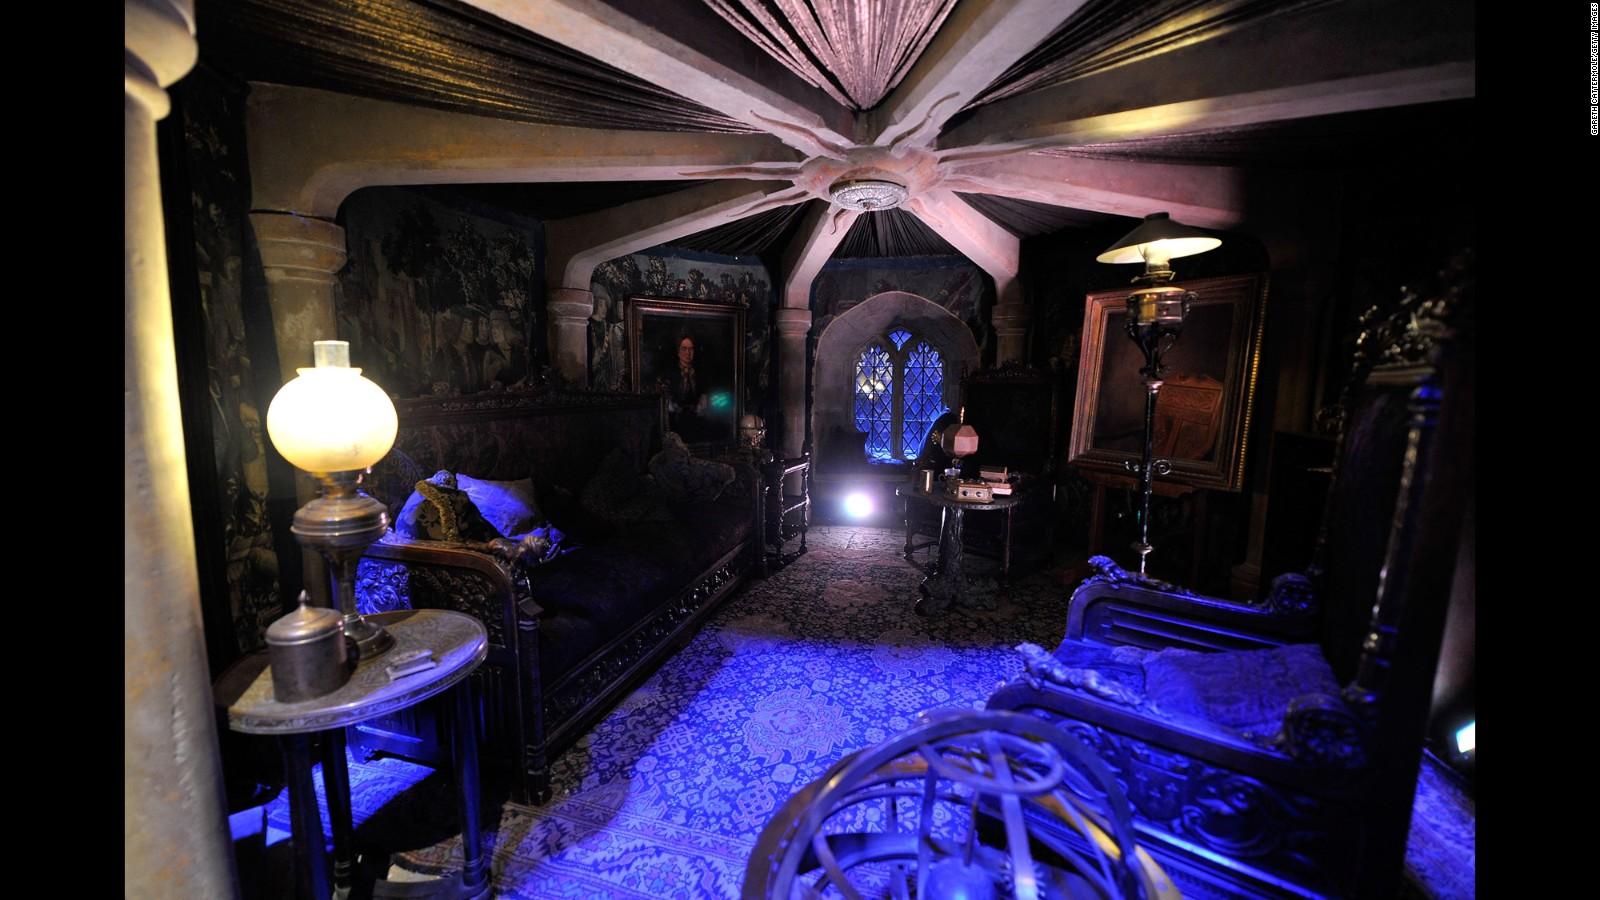 Most Inspiring Wallpaper Harry Potter Dining Hall - 150930072227-06-hp-studio-full-169  Best Photo Reference_19249.jpg